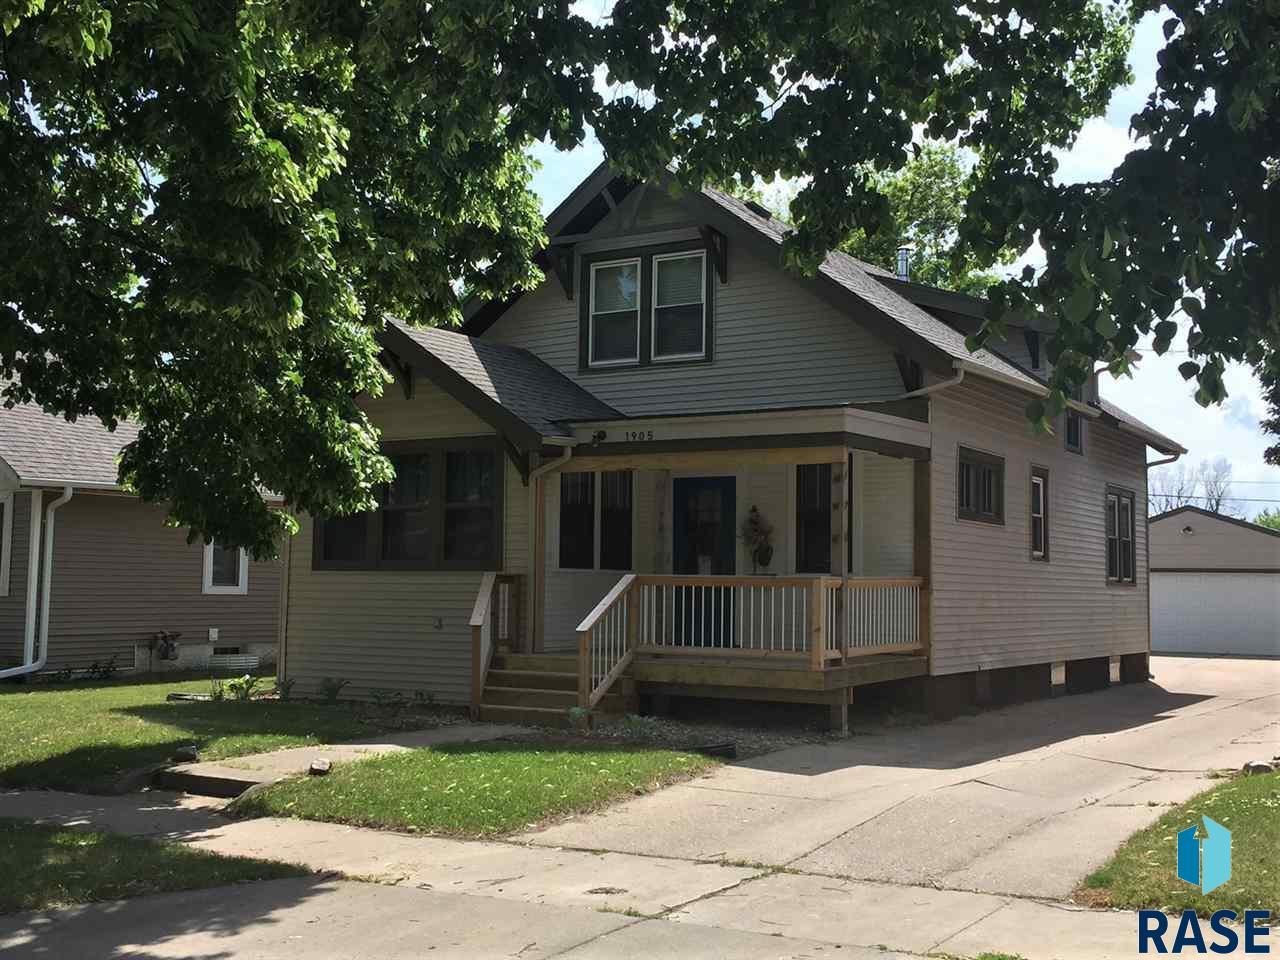 1905 S Dakota Ave, Sioux Falls, SD 57105